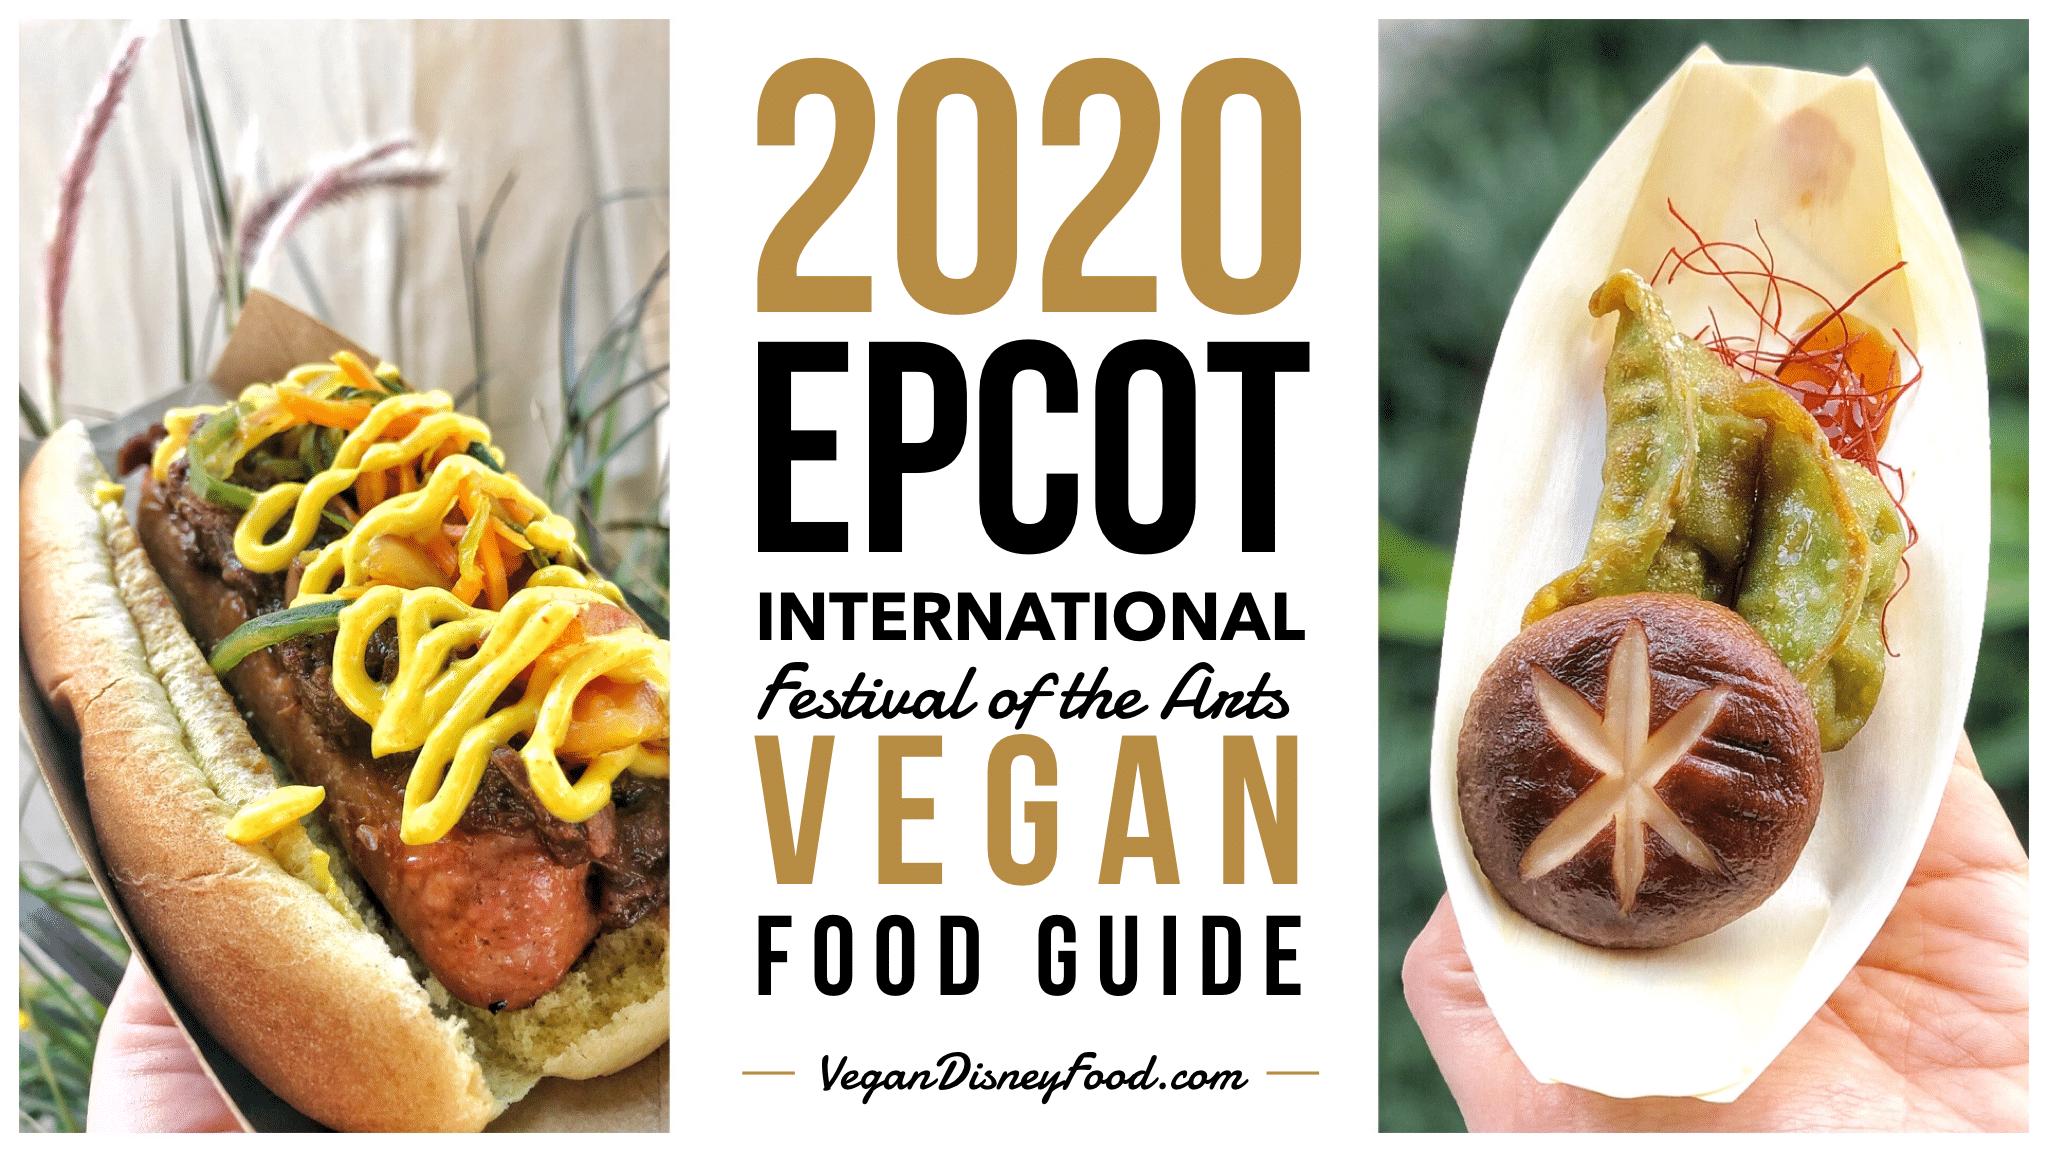 Epcot International Festival of the Arts Vegan Food Guide